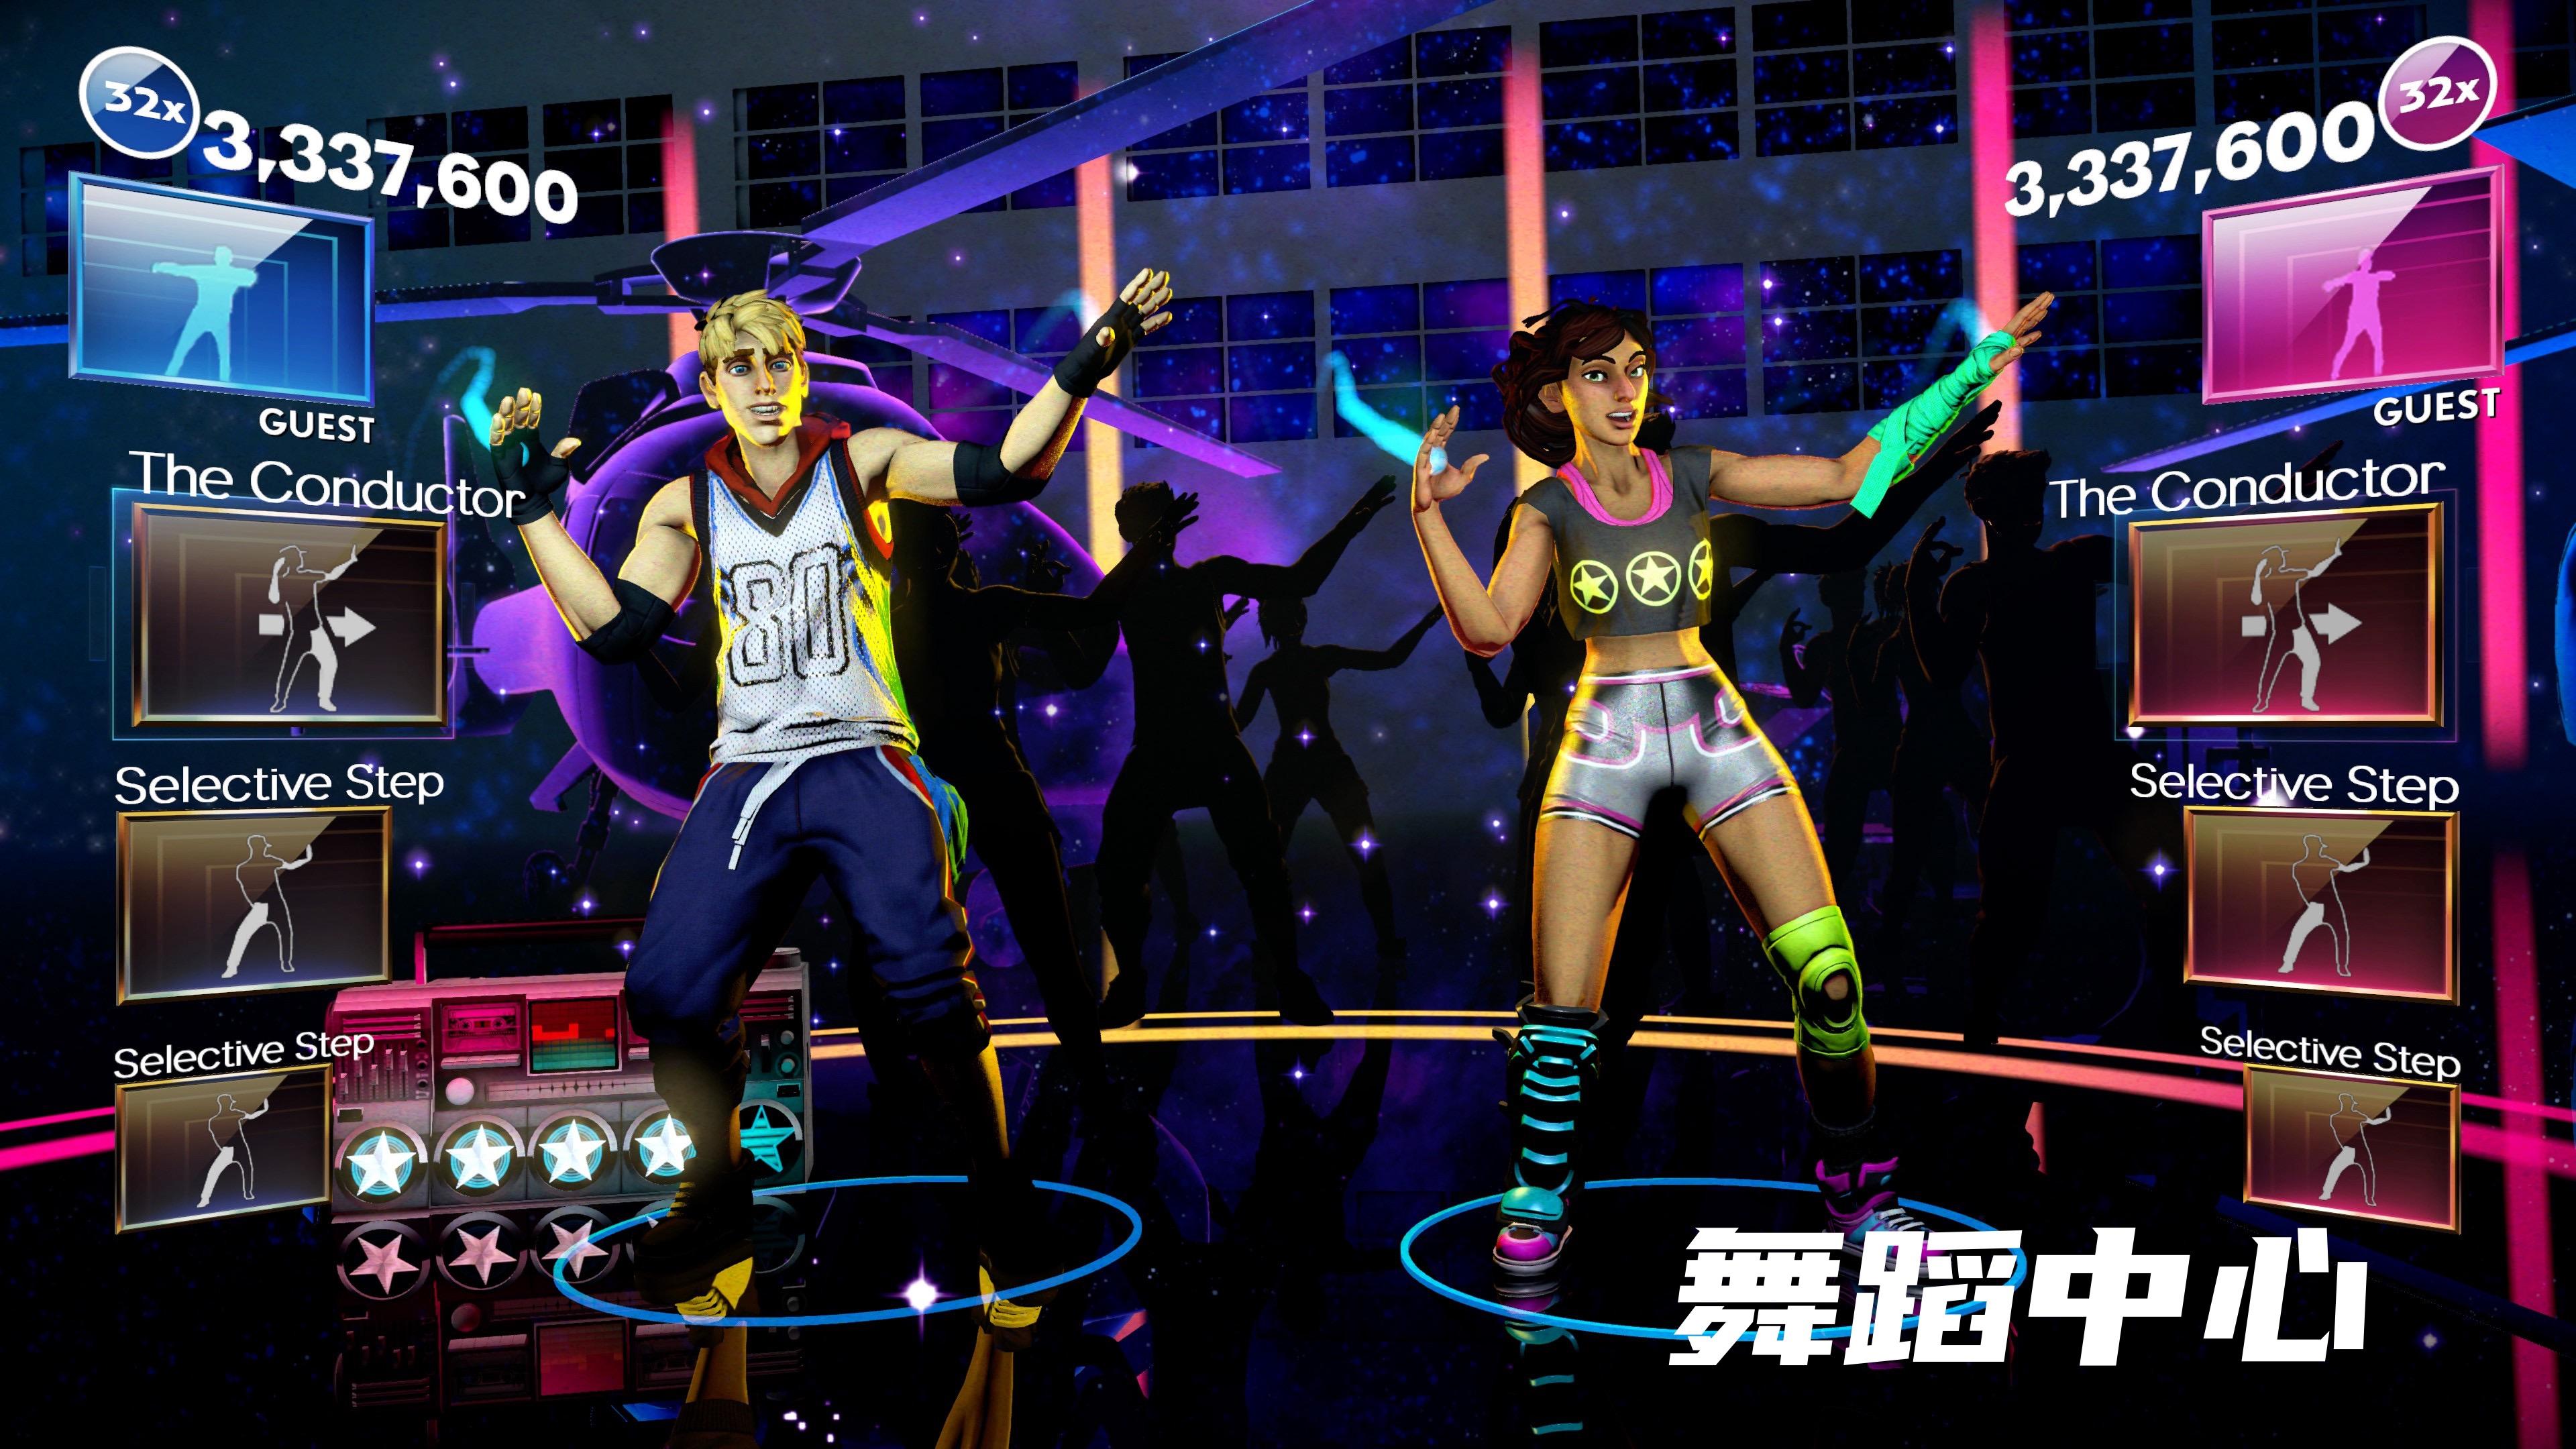 XBOX360 体感游戏 《舞蹈中心》 英文 下载